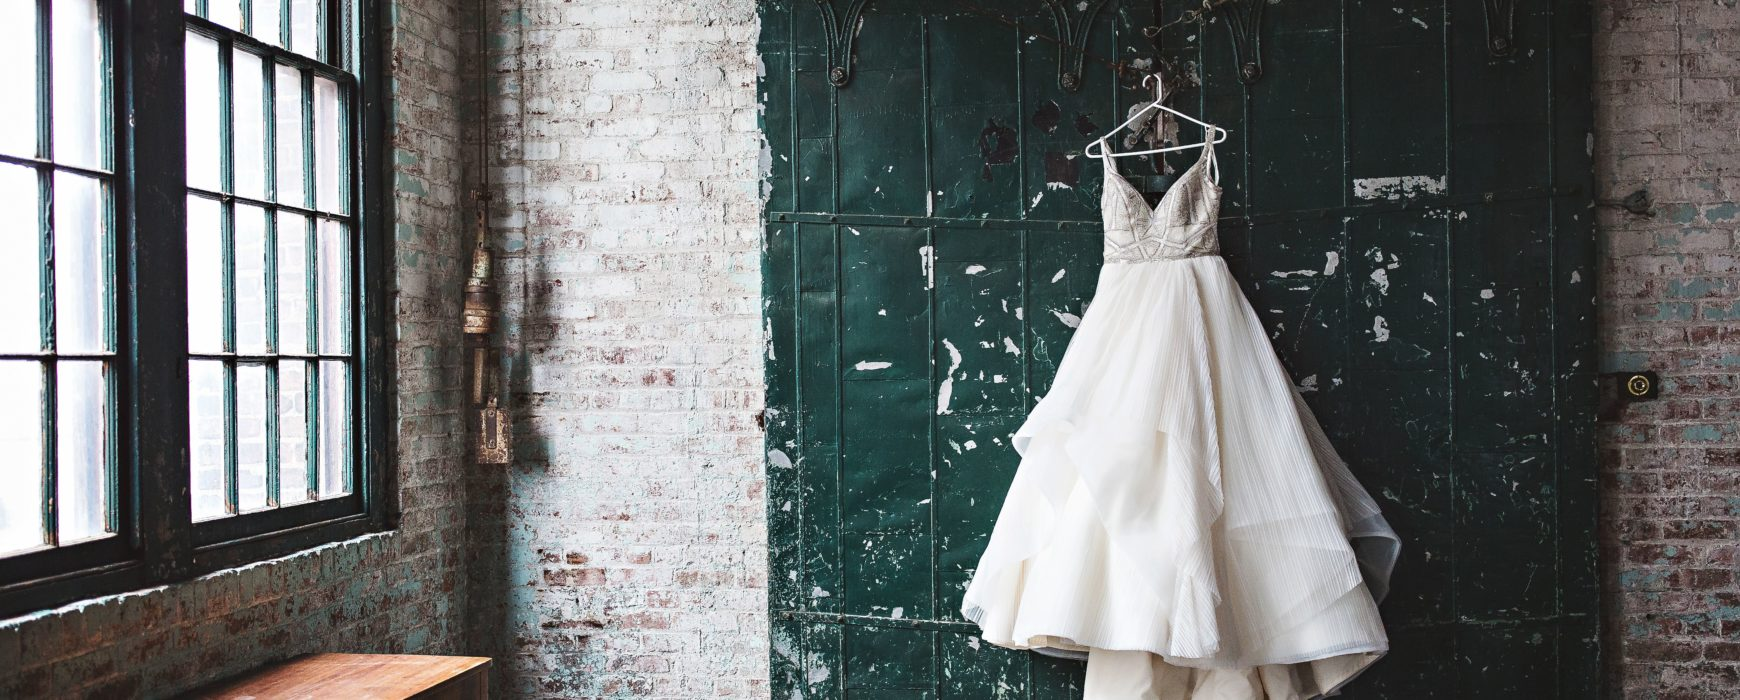 Wedding dress hanging on a sliding barn door